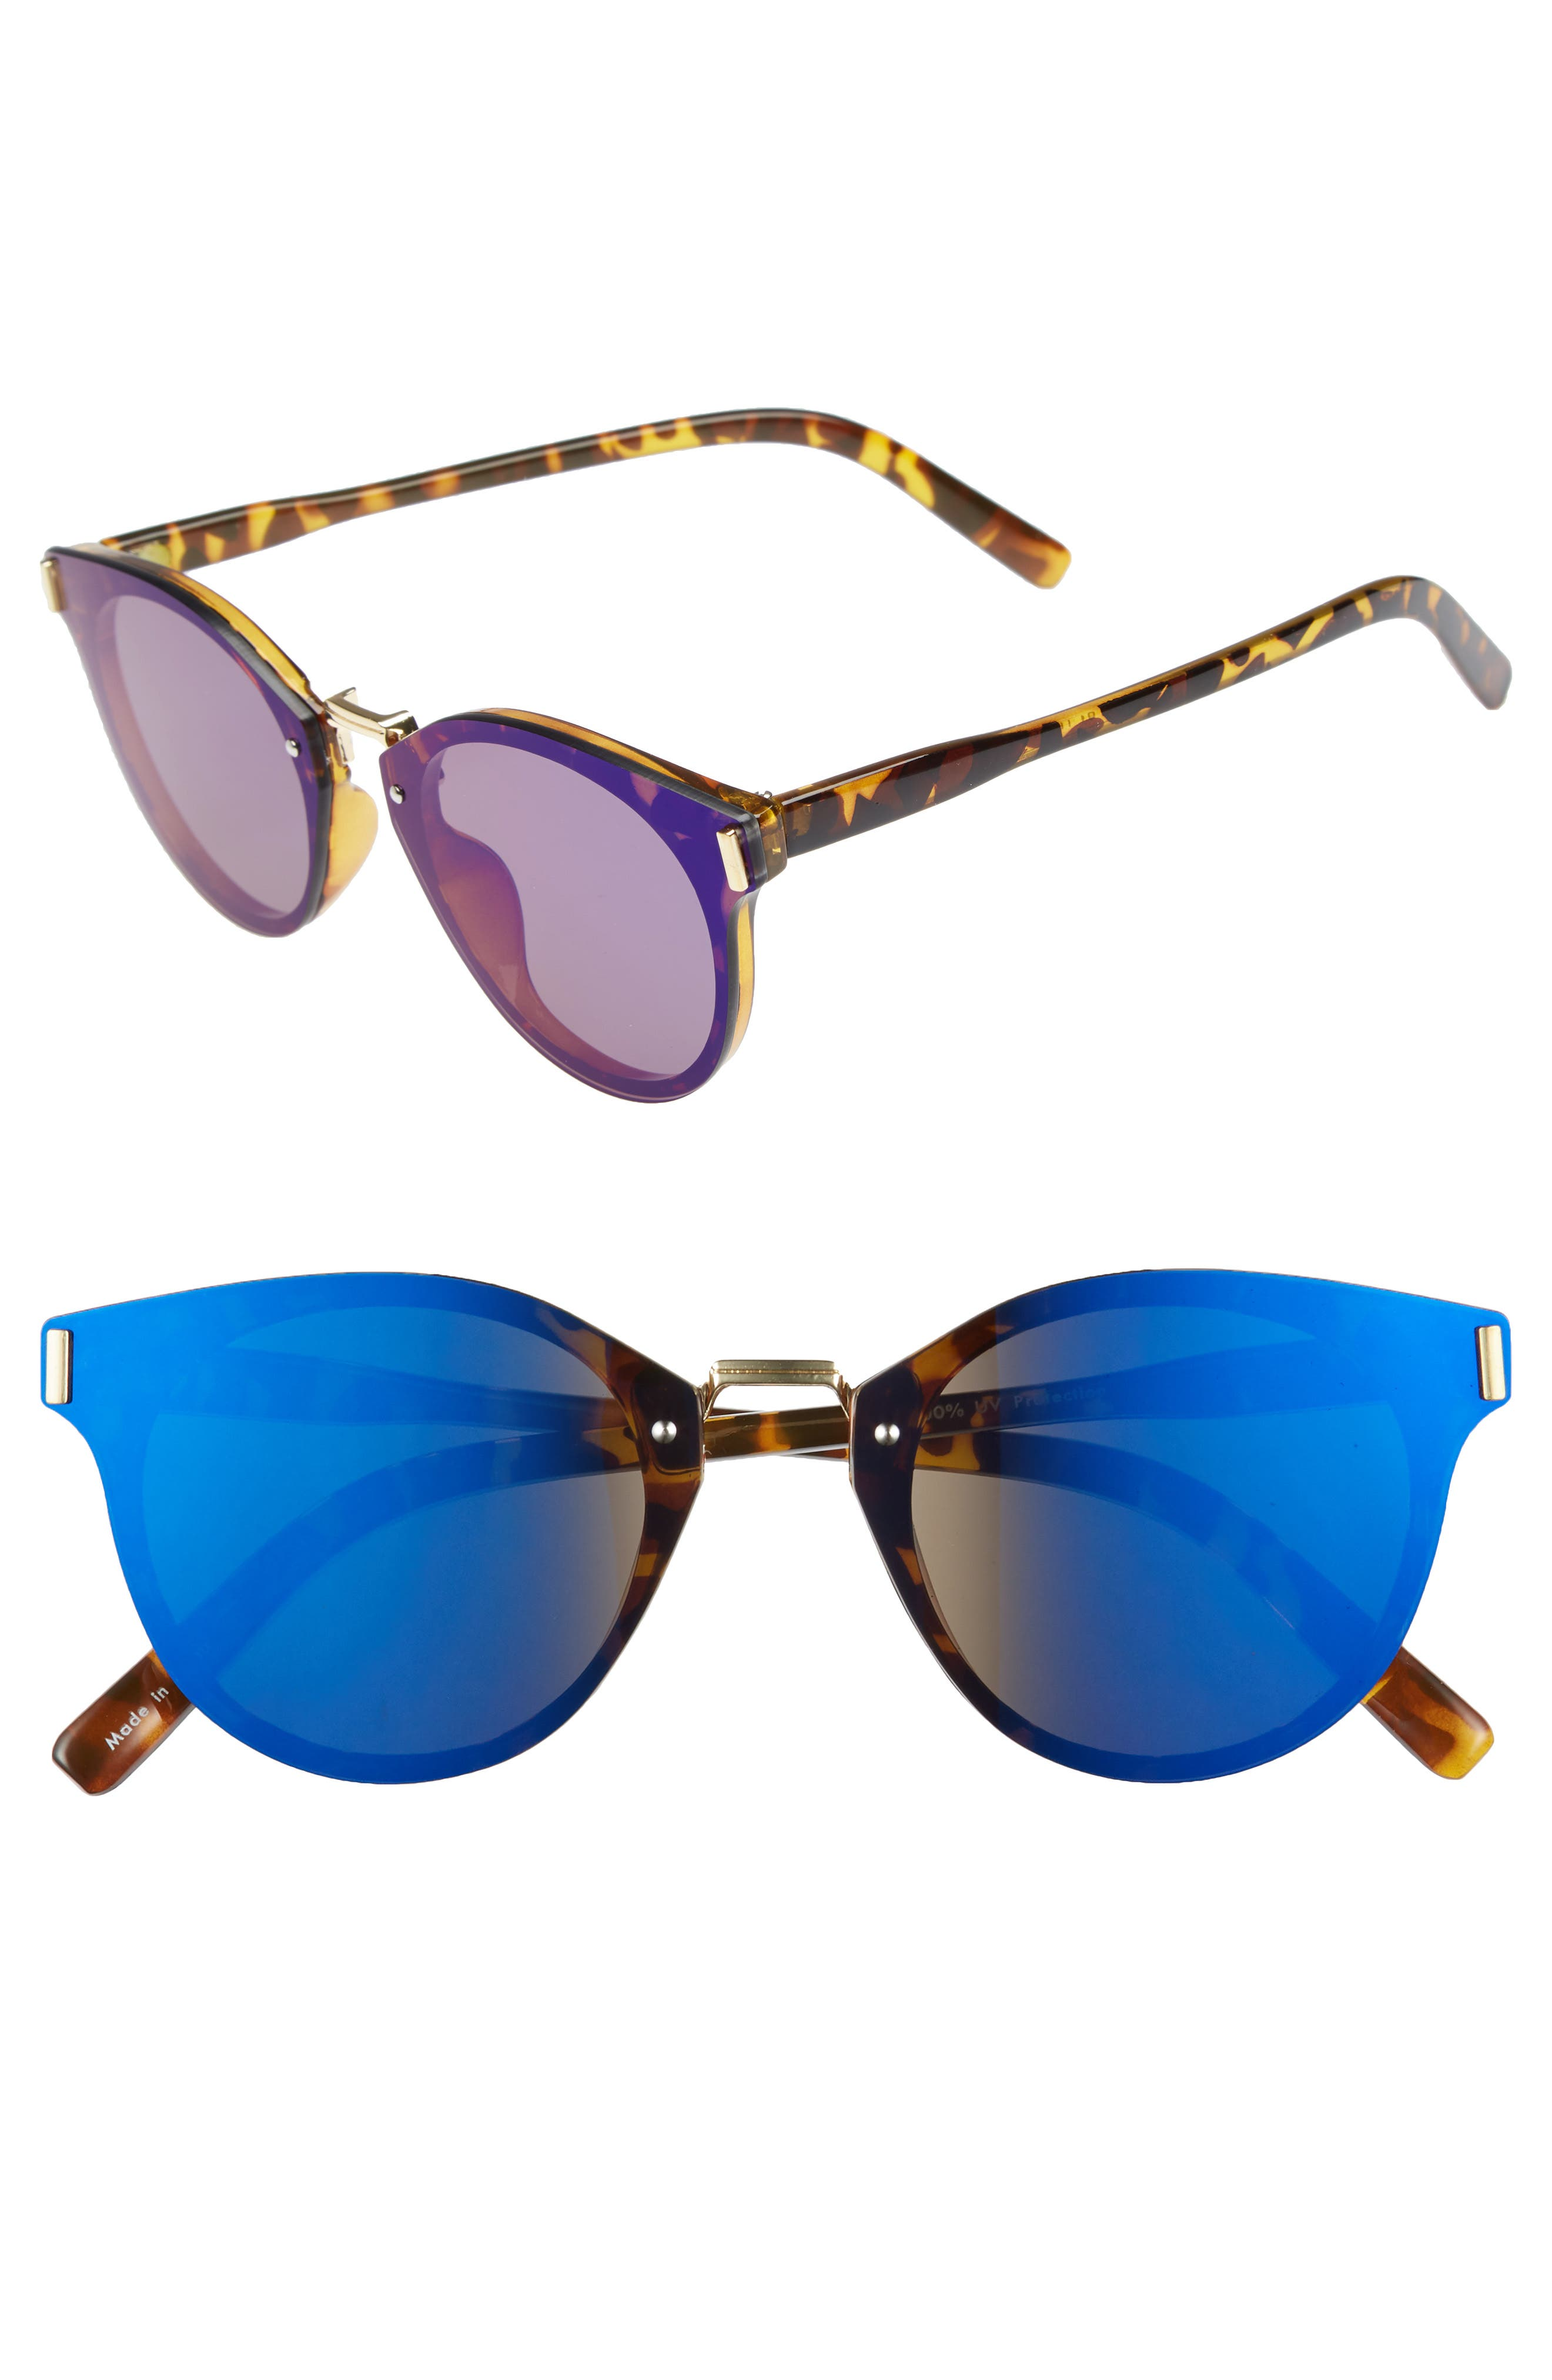 Flat Cat Eye Sunglasses,                             Main thumbnail 1, color,                             Tort/ Blue